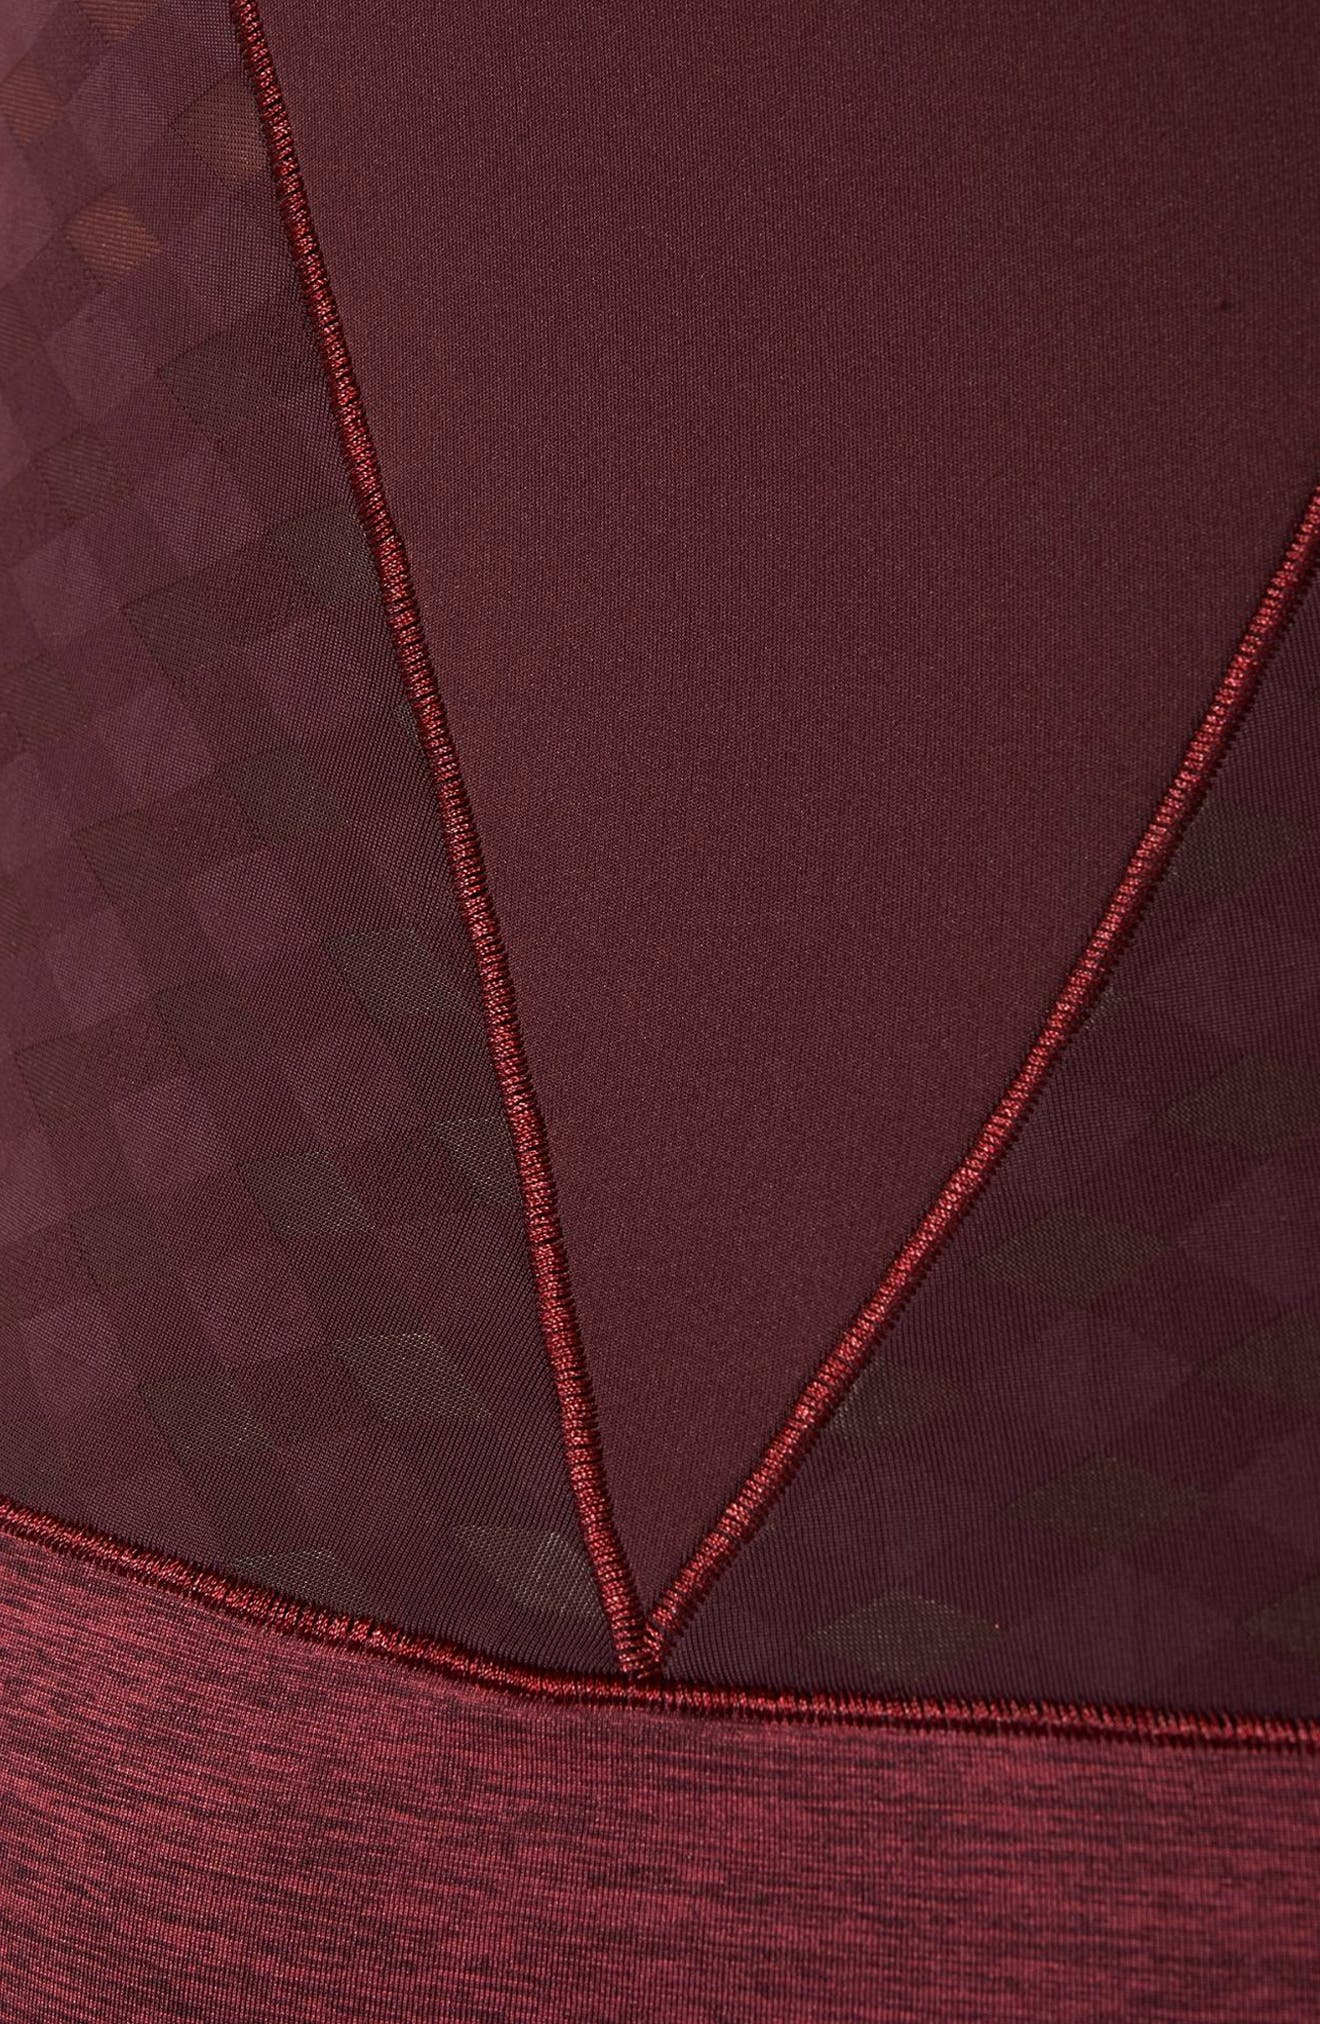 Training Tank,                             Alternate thumbnail 5, color,                             Dark Burgundy/ Legend Red